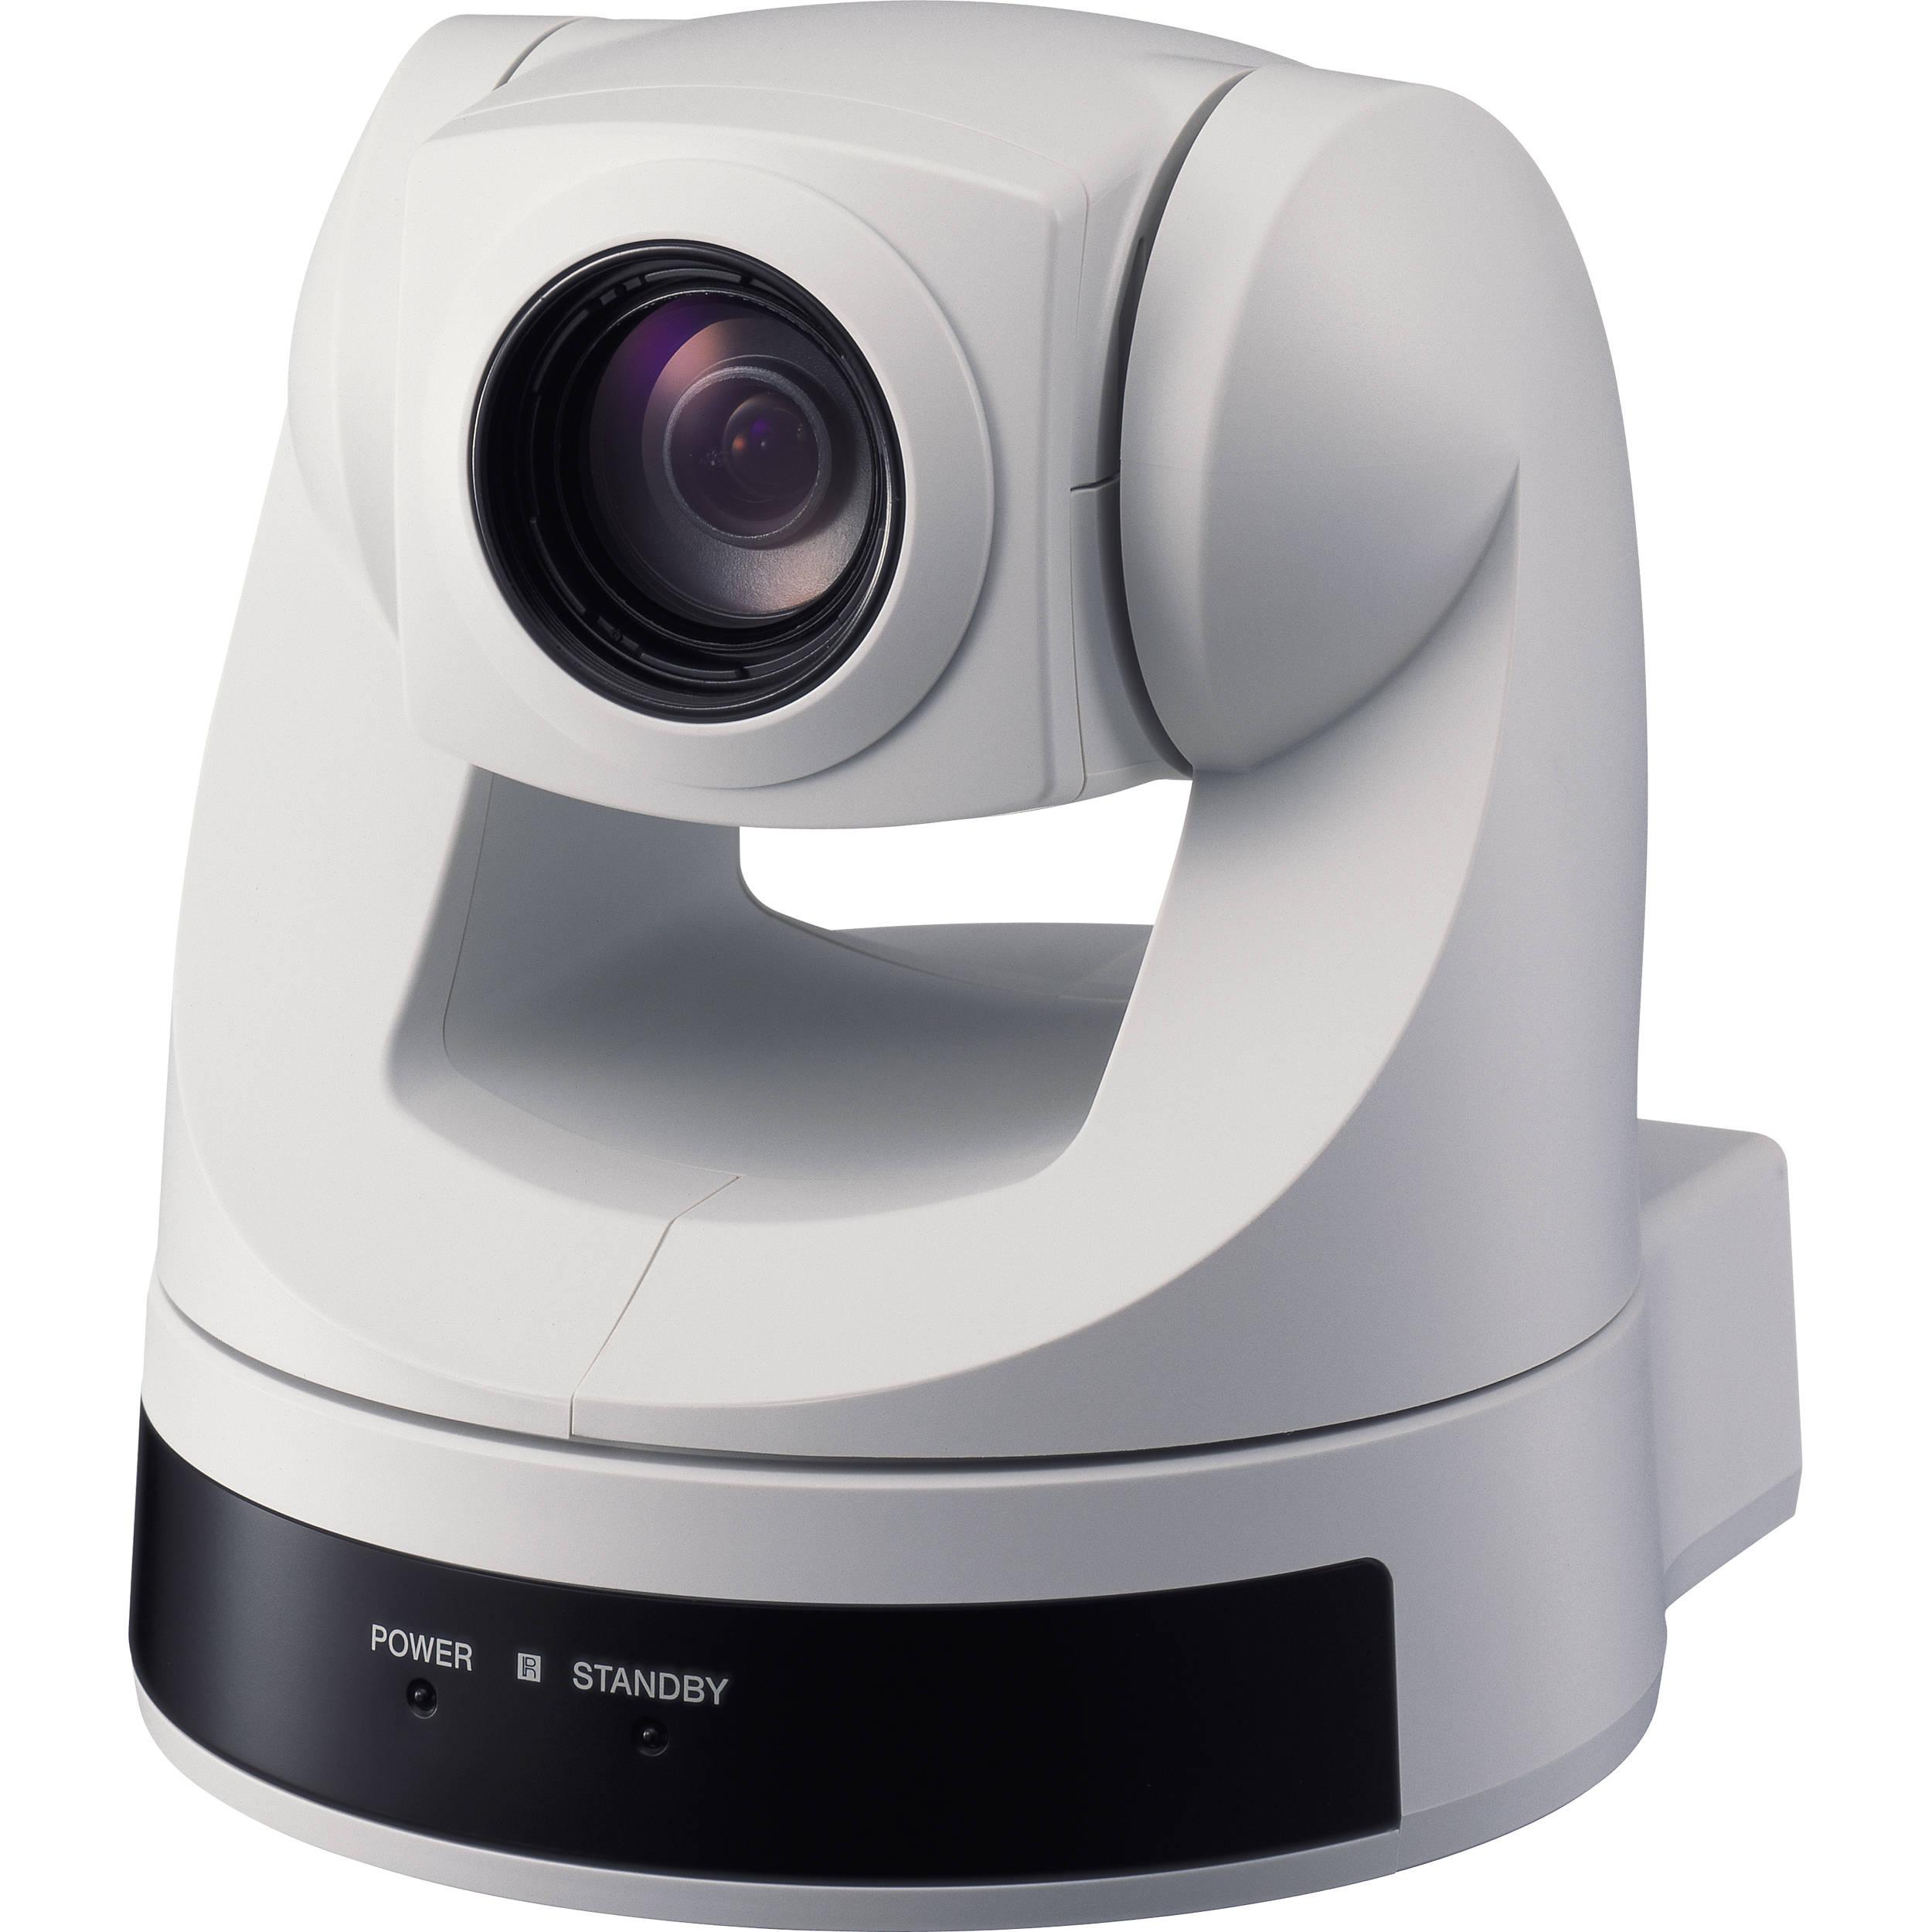 Sony EVI-D70 Pan / Tilt / Zoom Security Camera (White) EVID70/W